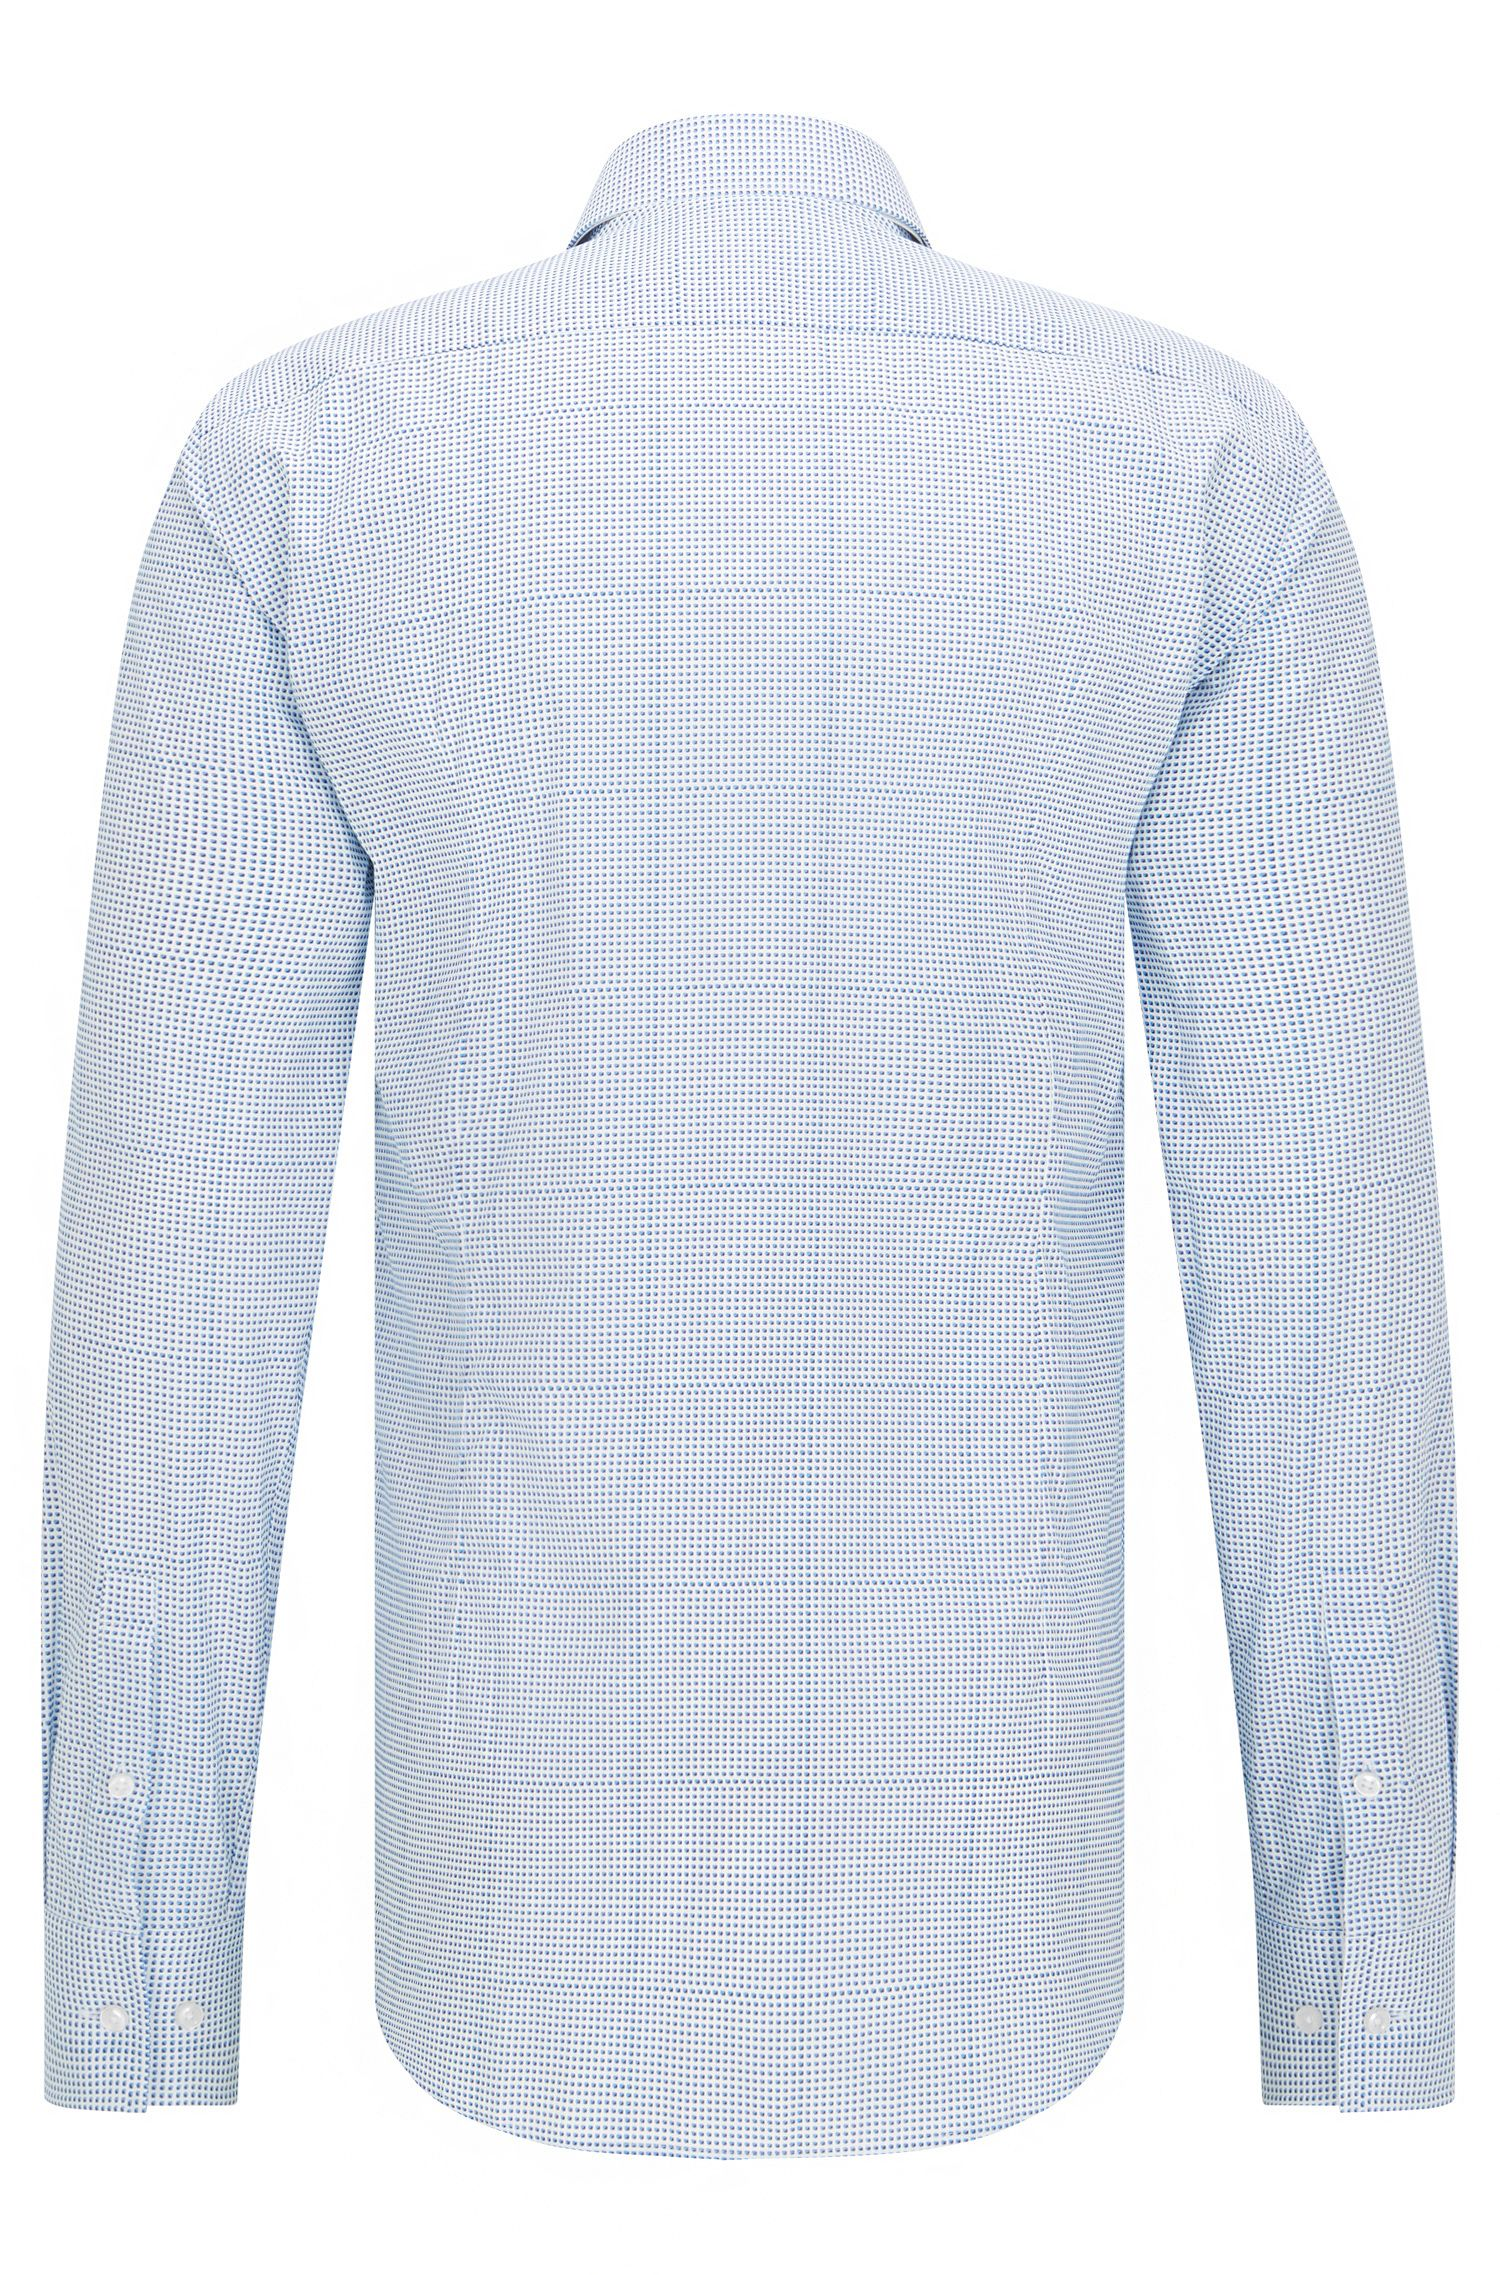 Micro Dot Cotton Dress Shirt, Slim Fit | Jason, Turquoise